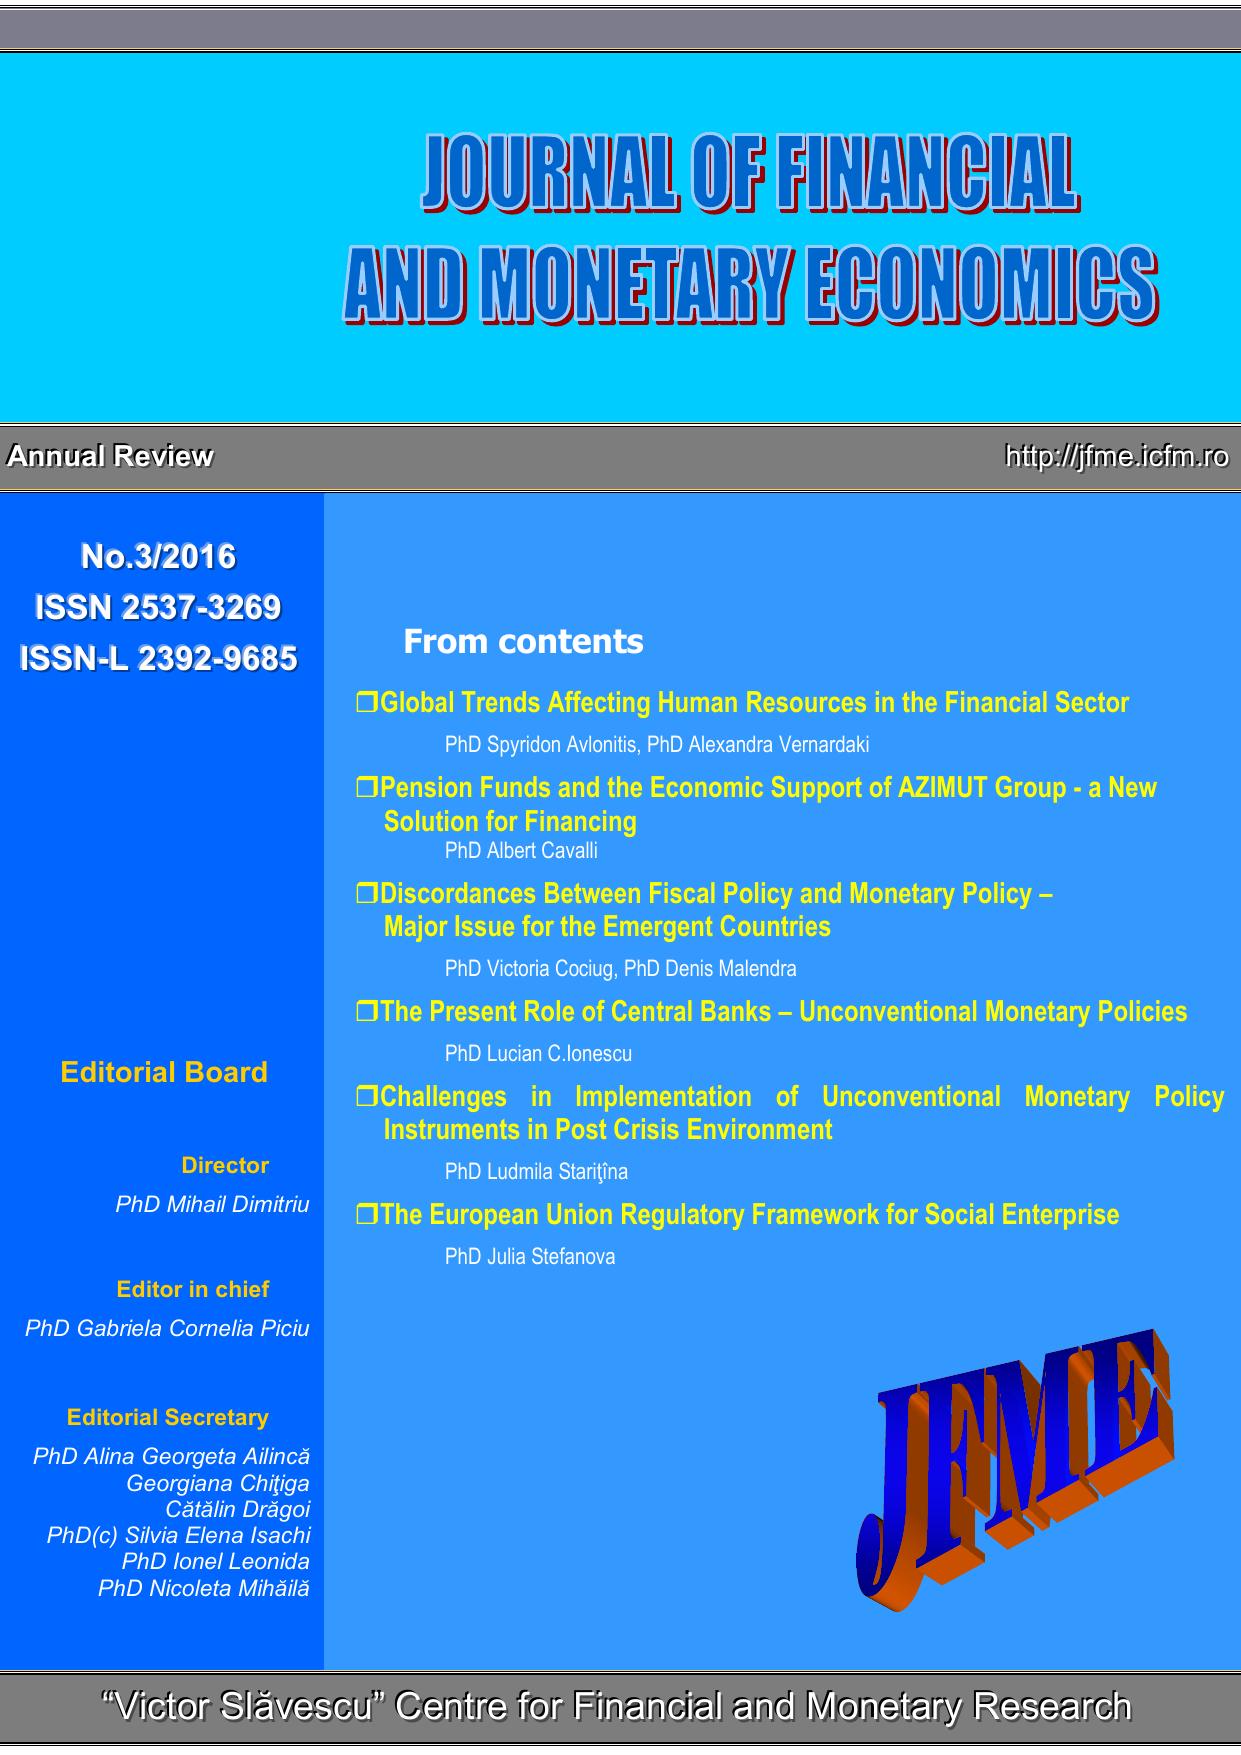 Journal of financial and monetary economics 0165189721 9363689de04256b5867d99cf25692647g fandeluxe Image collections